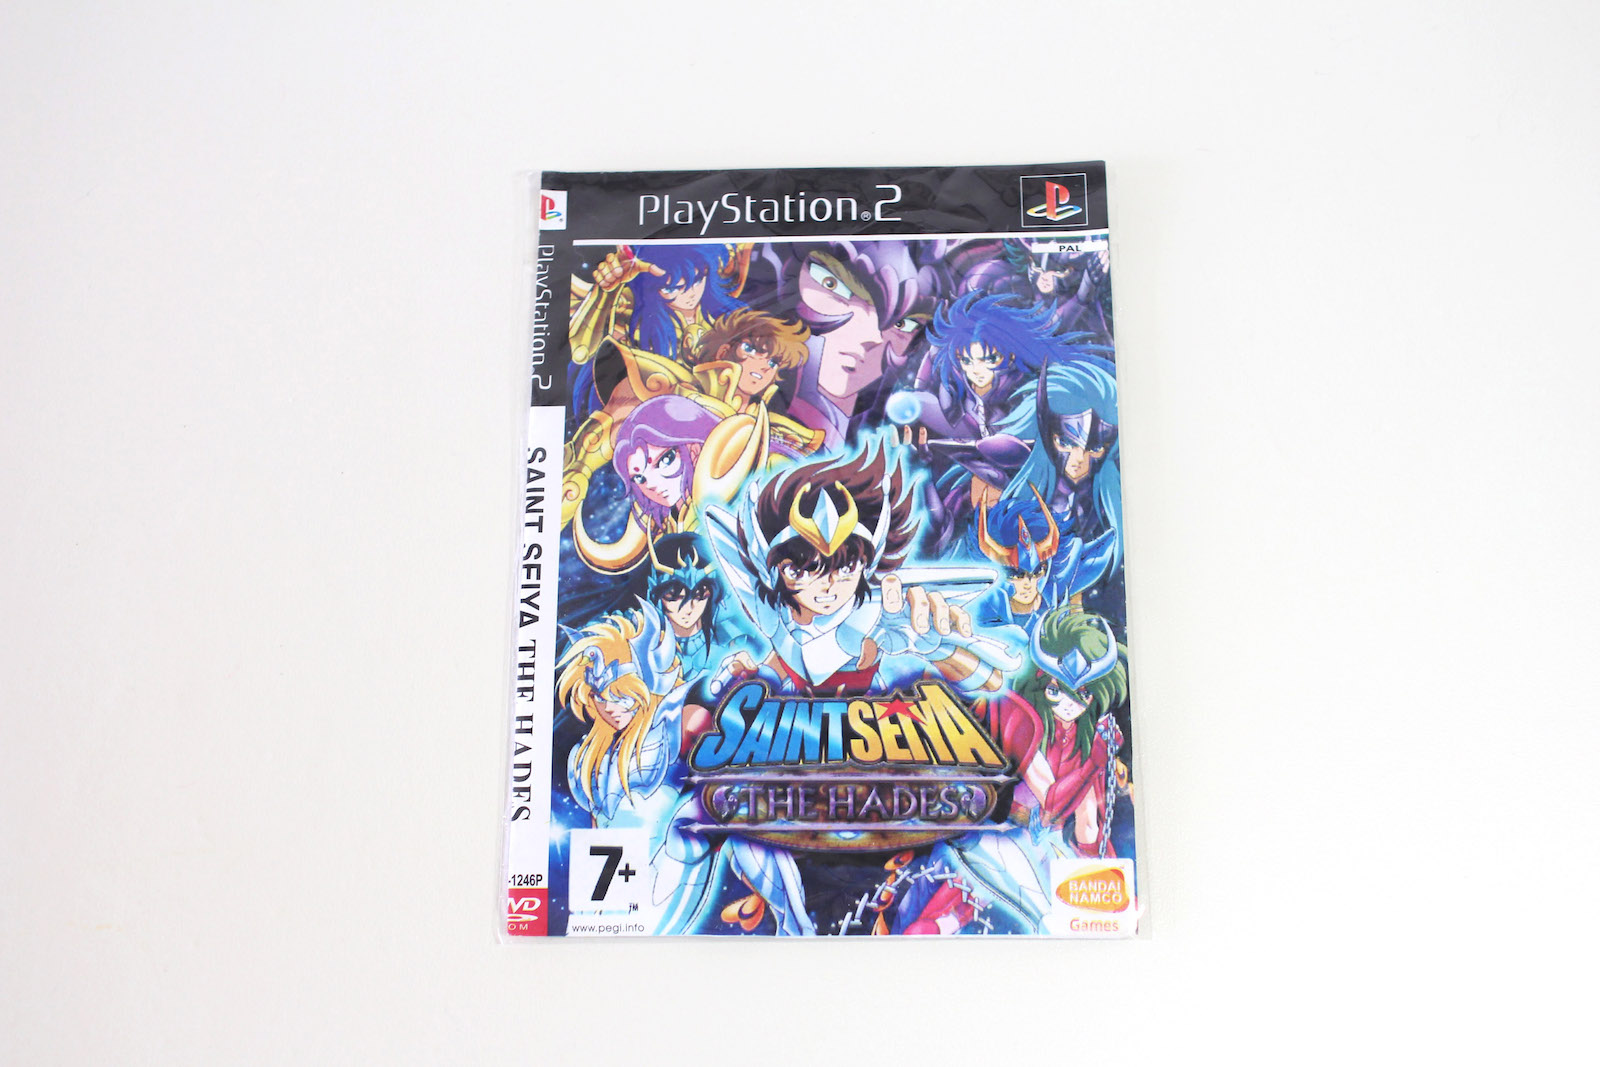 ae0e63a89fa1 How to Spot Bootleg PS2 Games – Blip